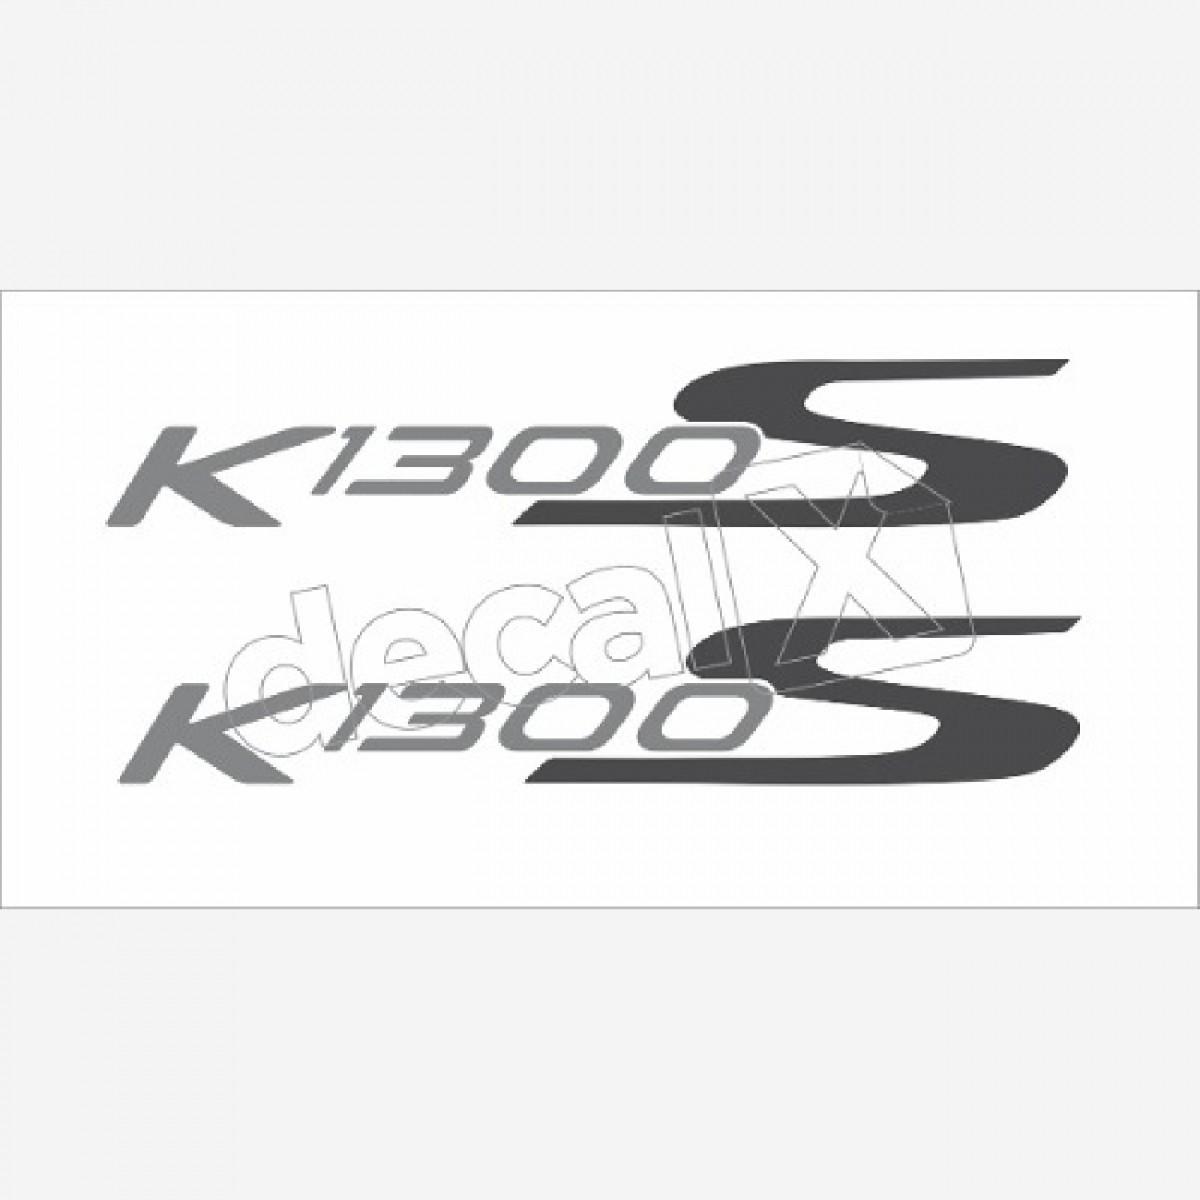 Emblema Adesivo Rabeta Bmw K1300s Branca Par Decalx